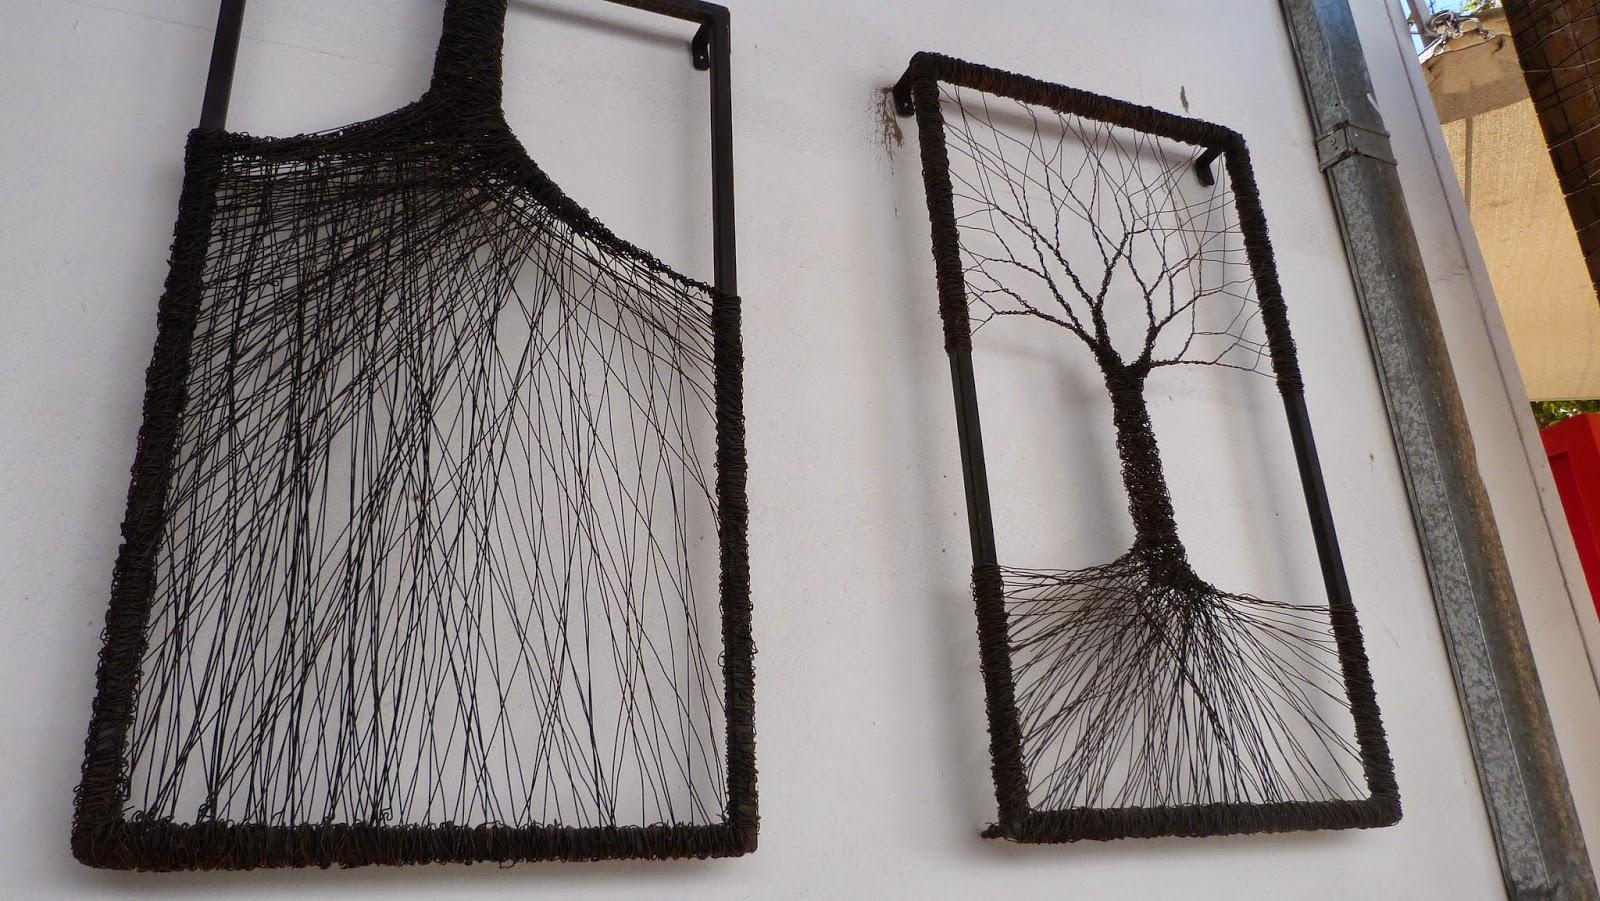 girasol al sol marzo 2014. Black Bedroom Furniture Sets. Home Design Ideas